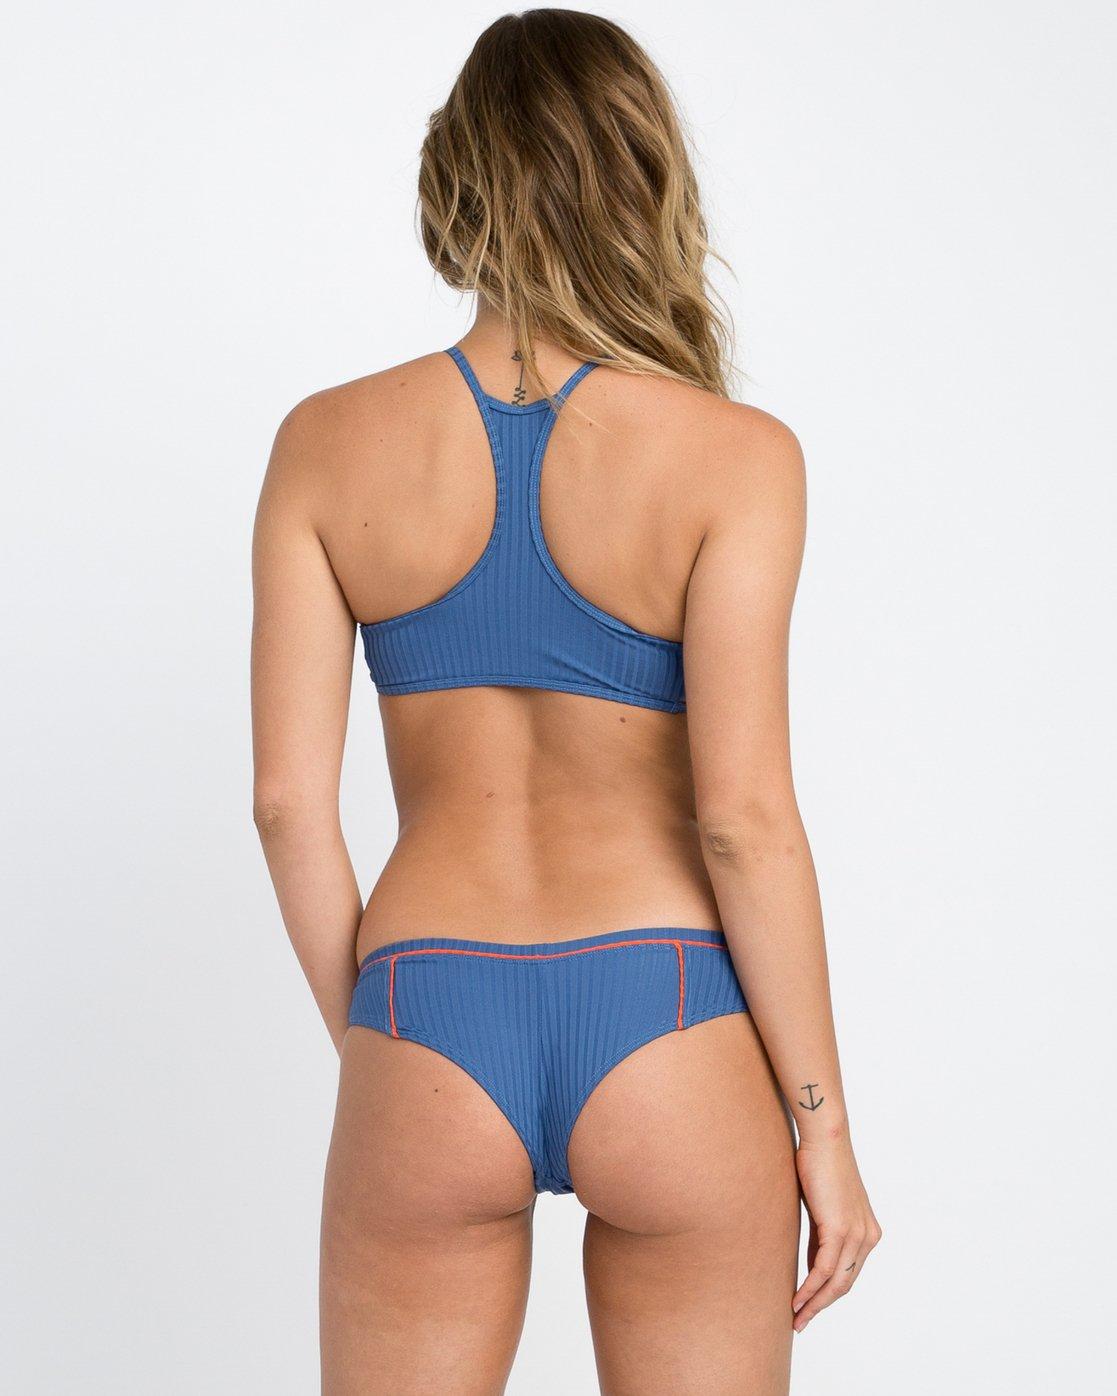 0 July Ribbed Cheeky Bikini Bottom Blue XB14PRJC RVCA